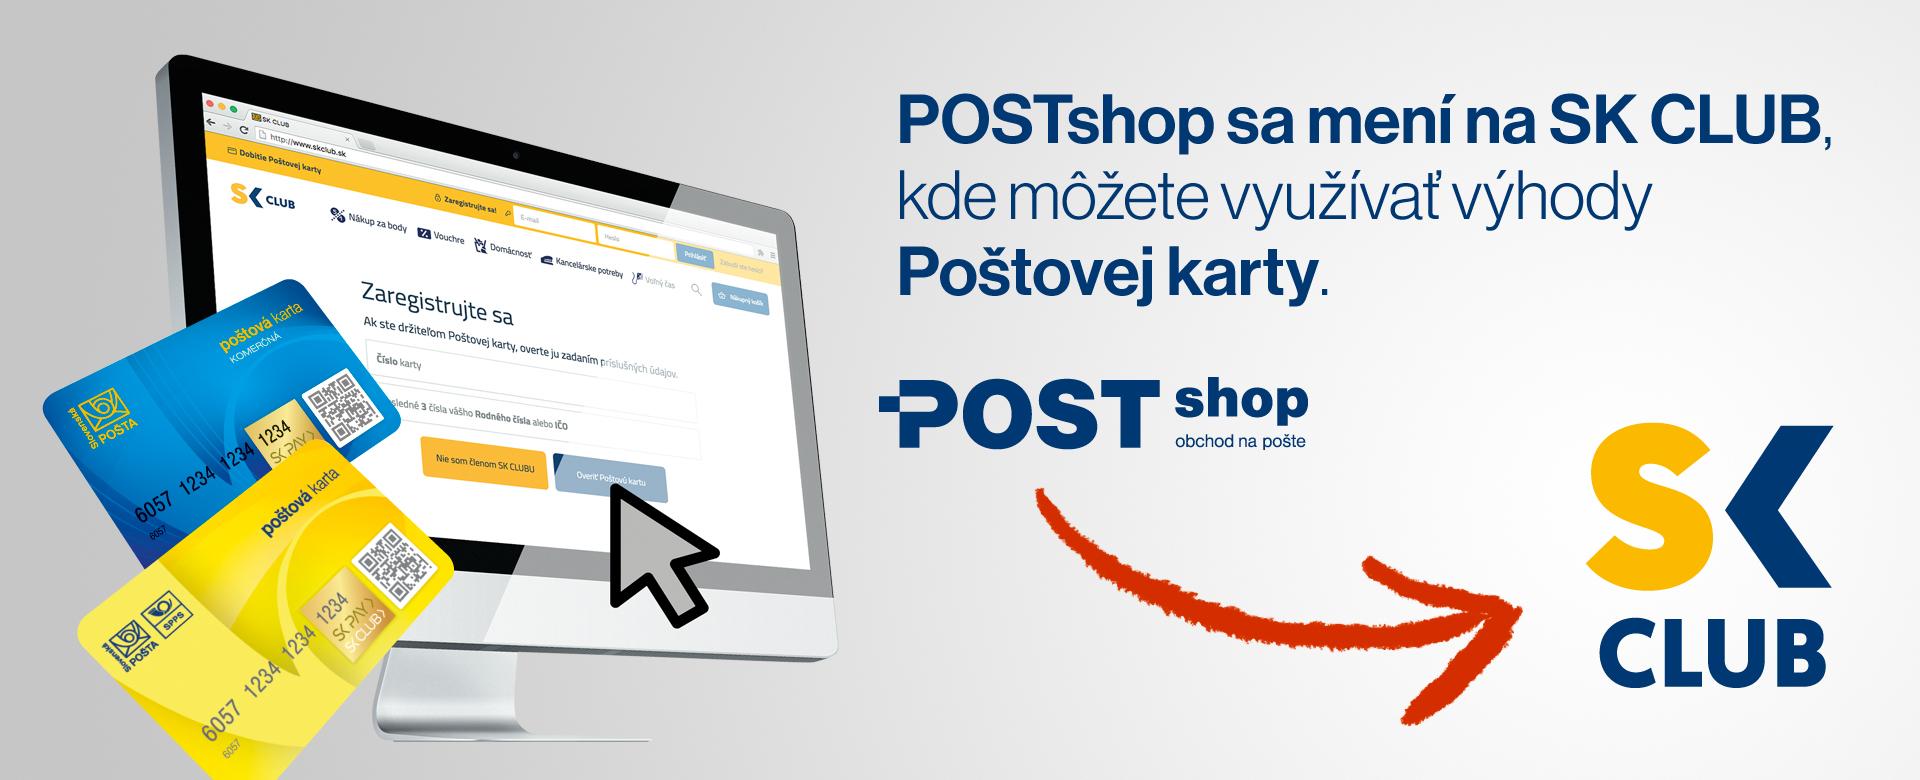 a6d2d2e714bd6 www.postshop.sk sa mení na SK CLUB!